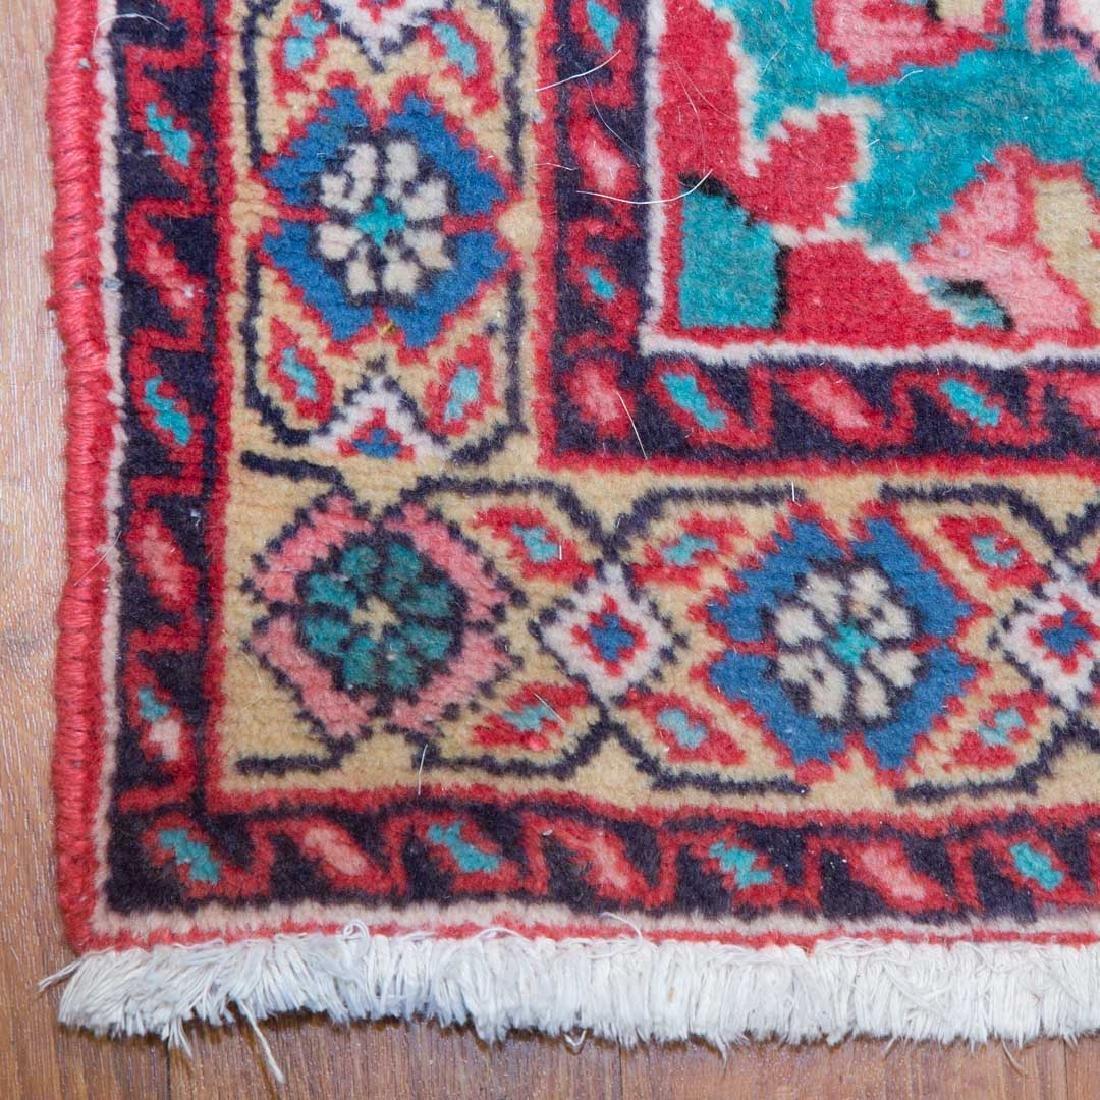 Persian Hamadan rug, approx. 4.1 x 6.6 - 2